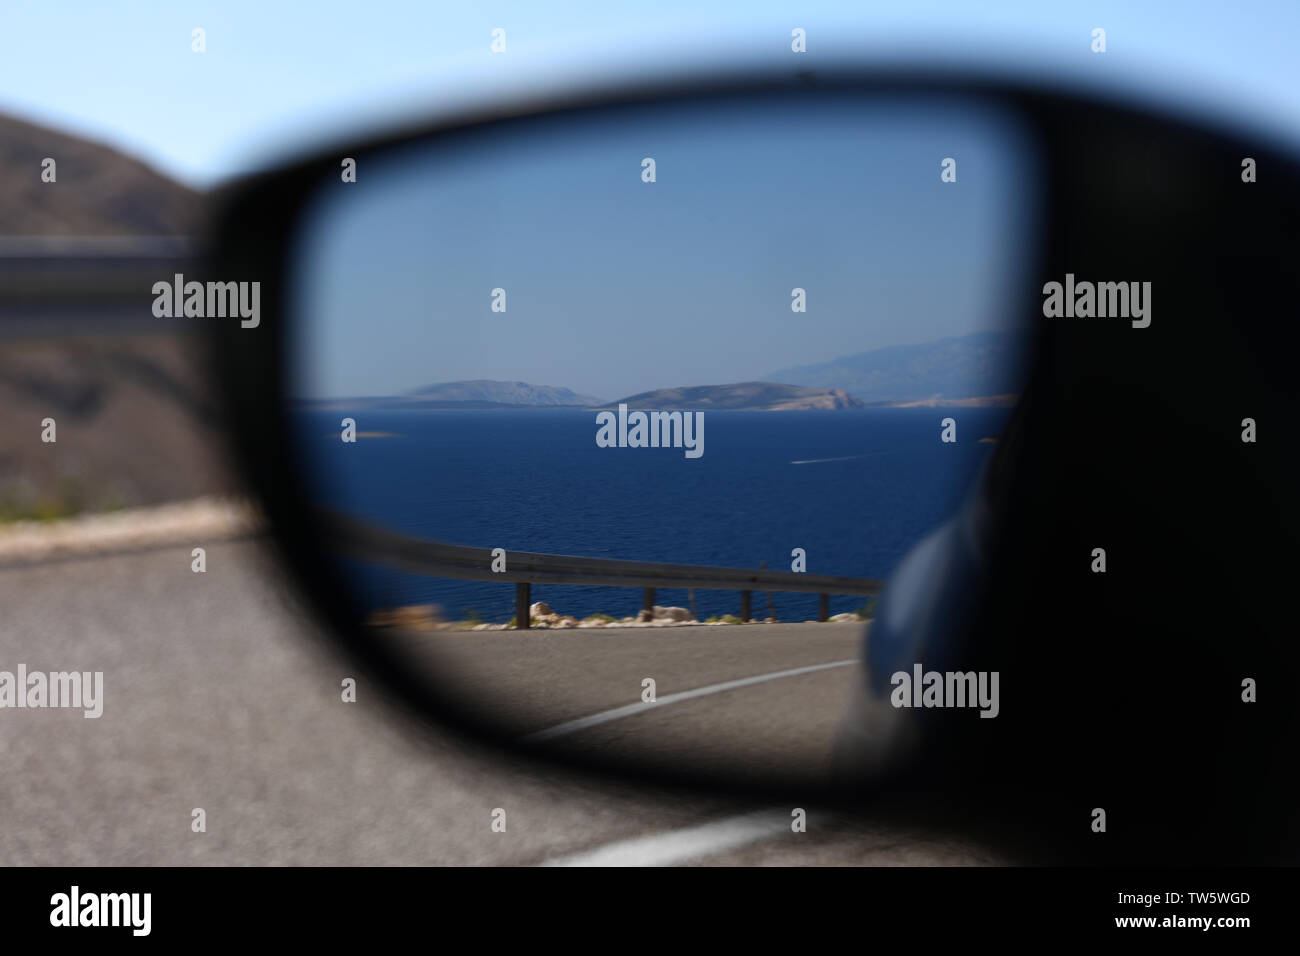 Picturesque view onto the marina via the auto mirror Stock Photo